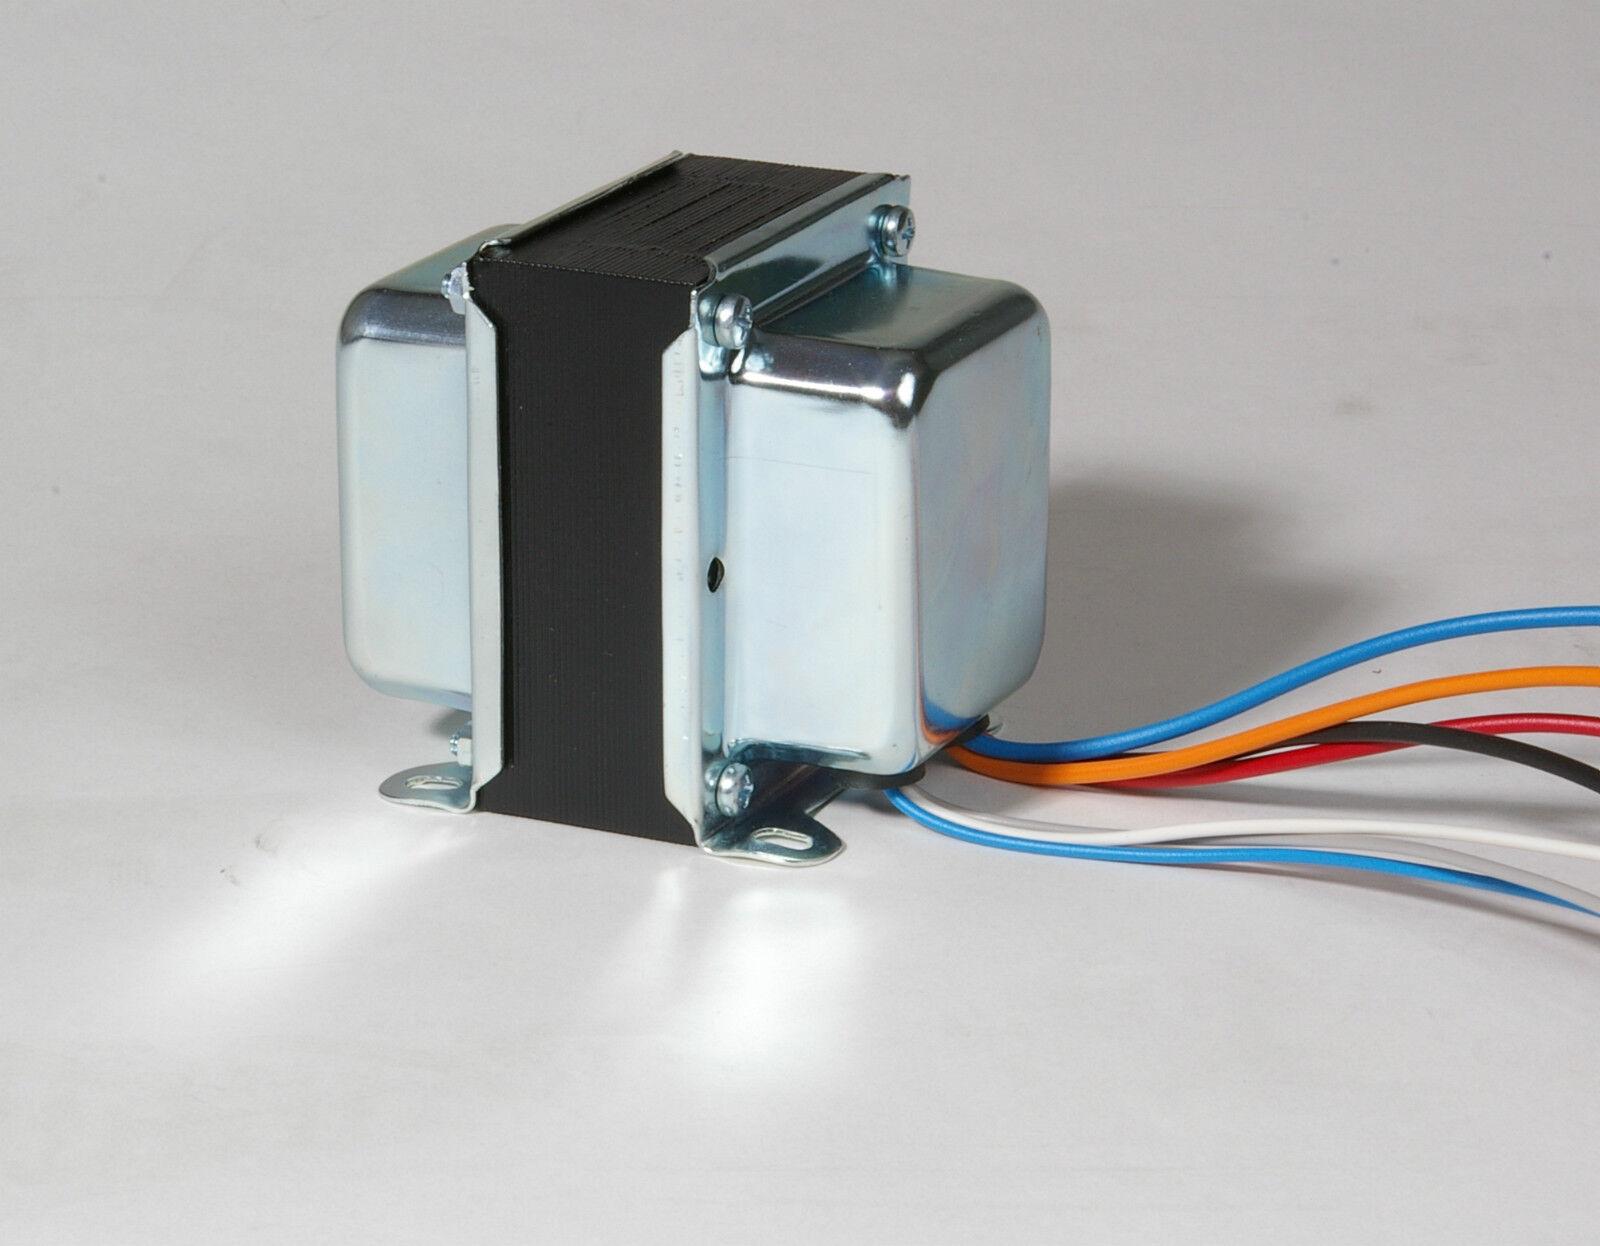 Output transformer Marshall, Fender 30W ( Gegentakt 4 x EL84) Rohr amplifier